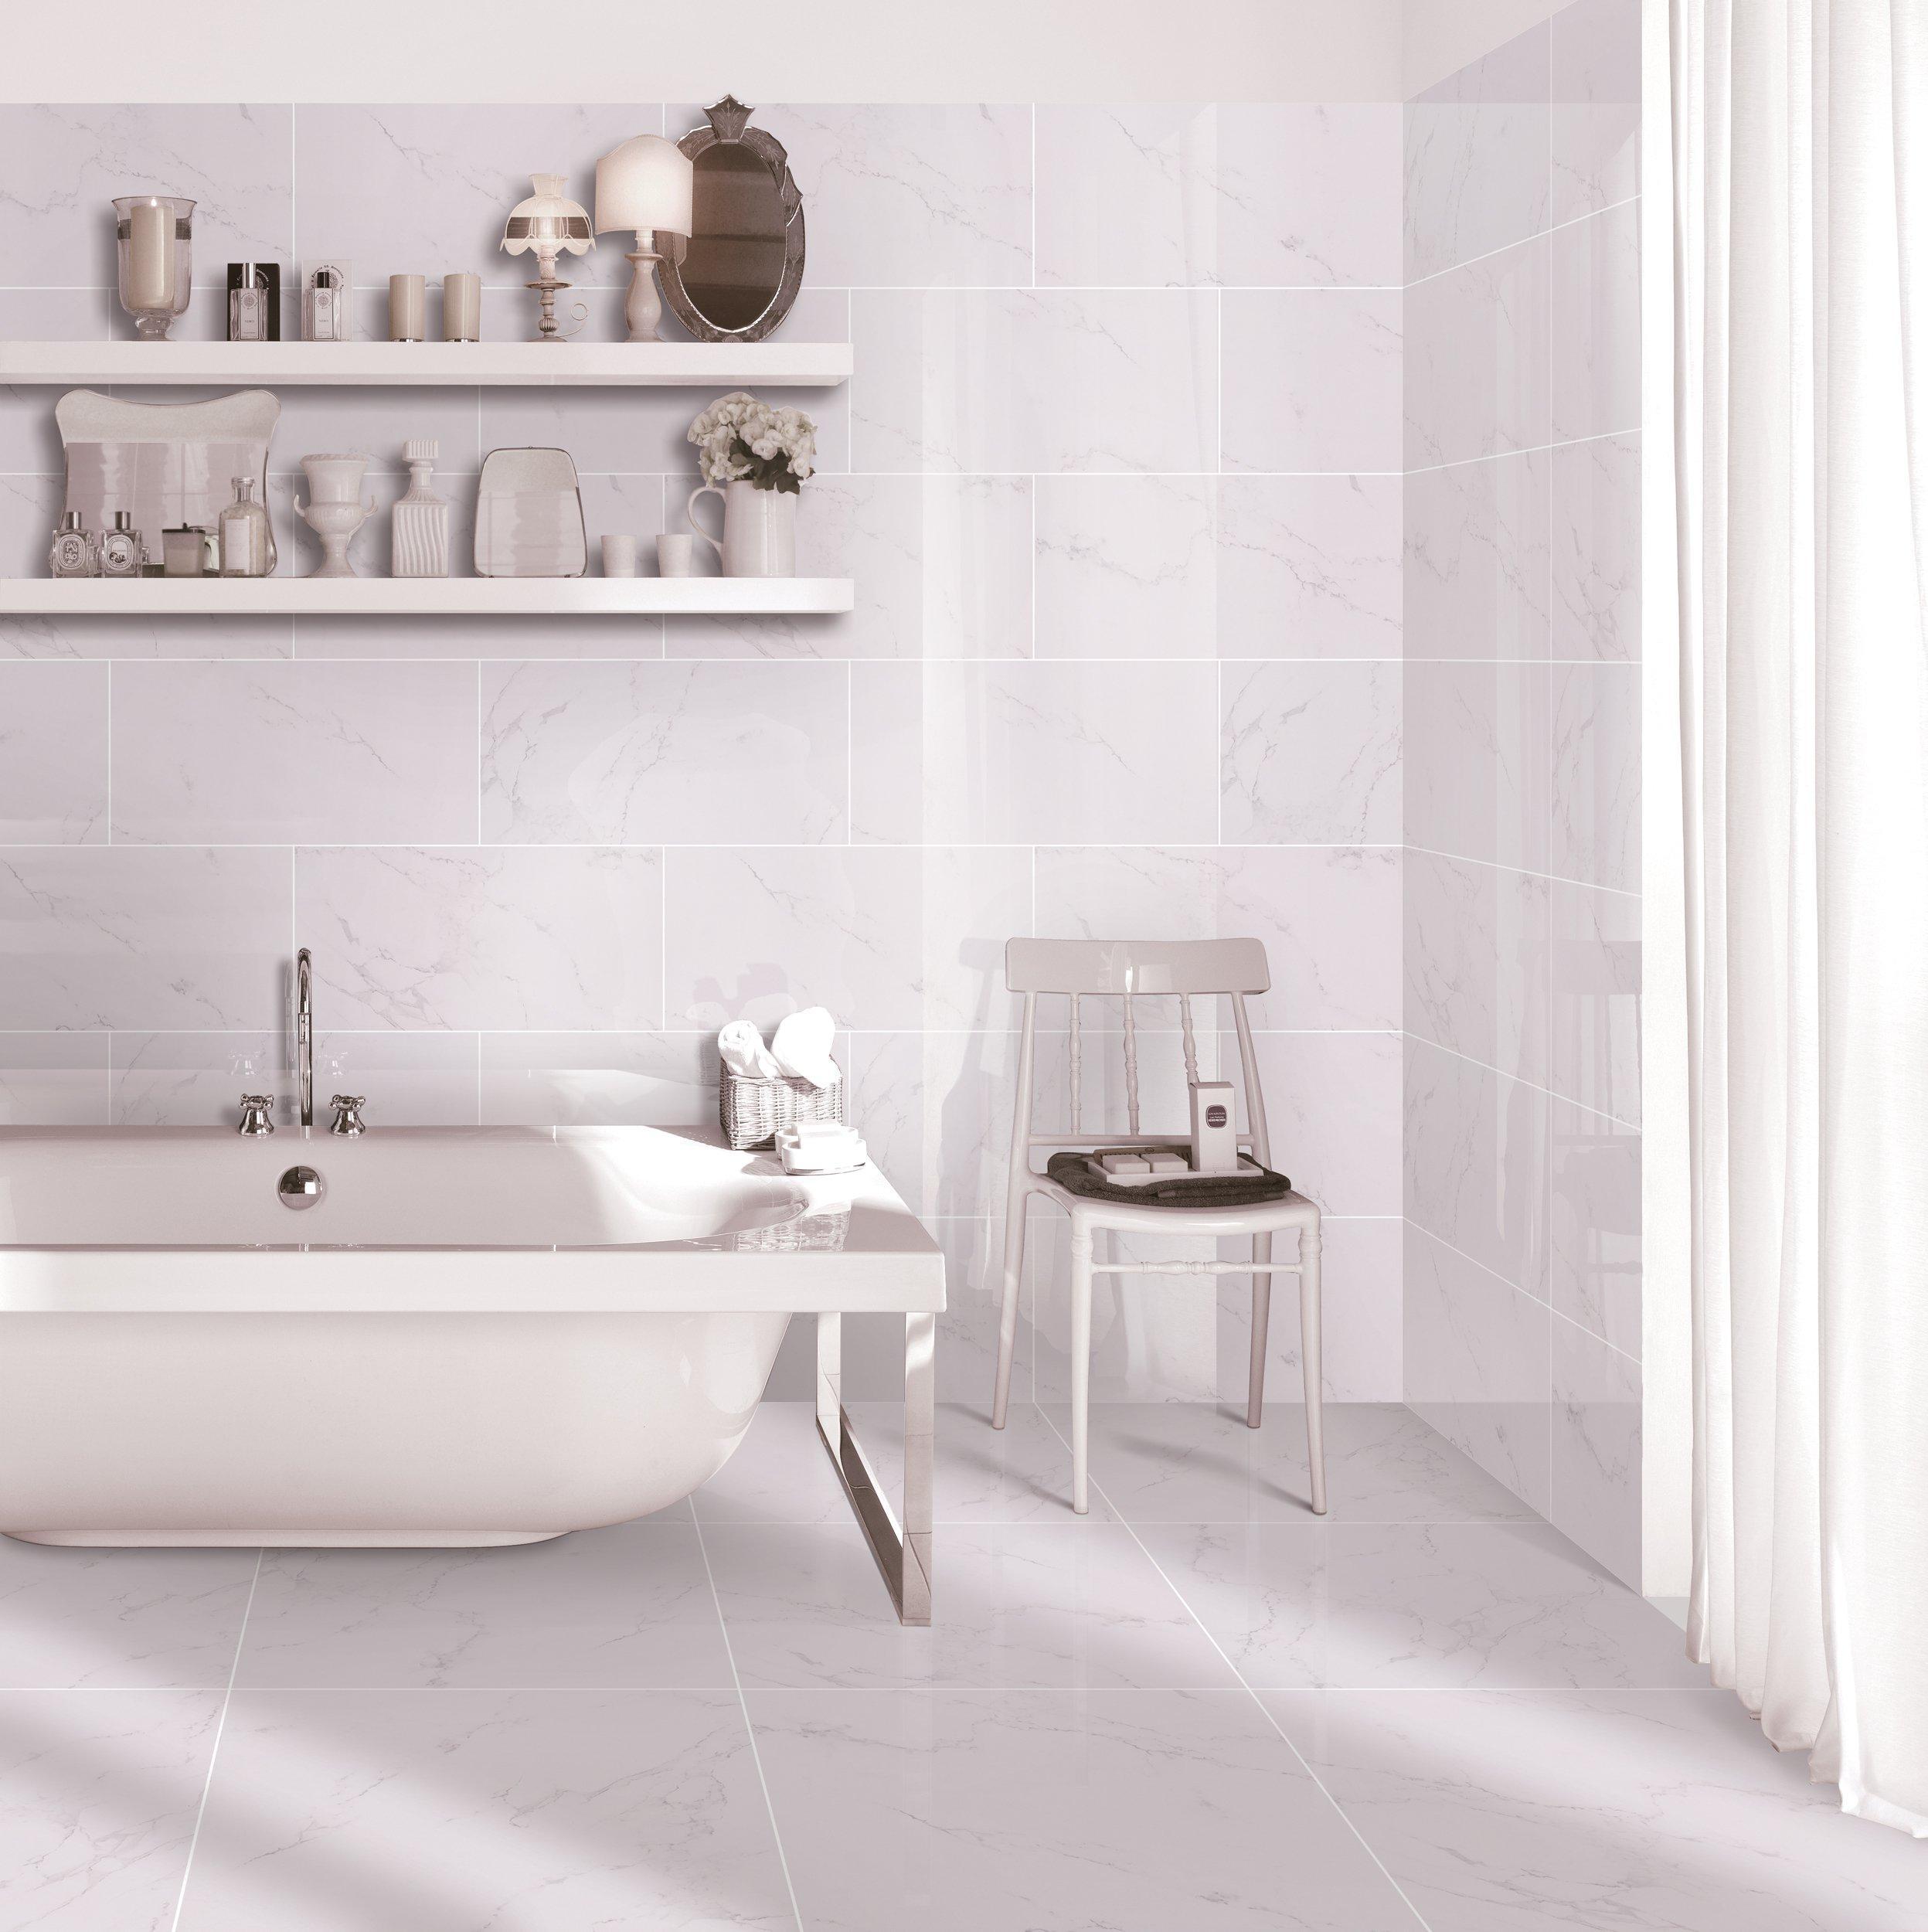 builtech.co] 100+ White Porcelain Tile Floor Images | My Blog | Best ...